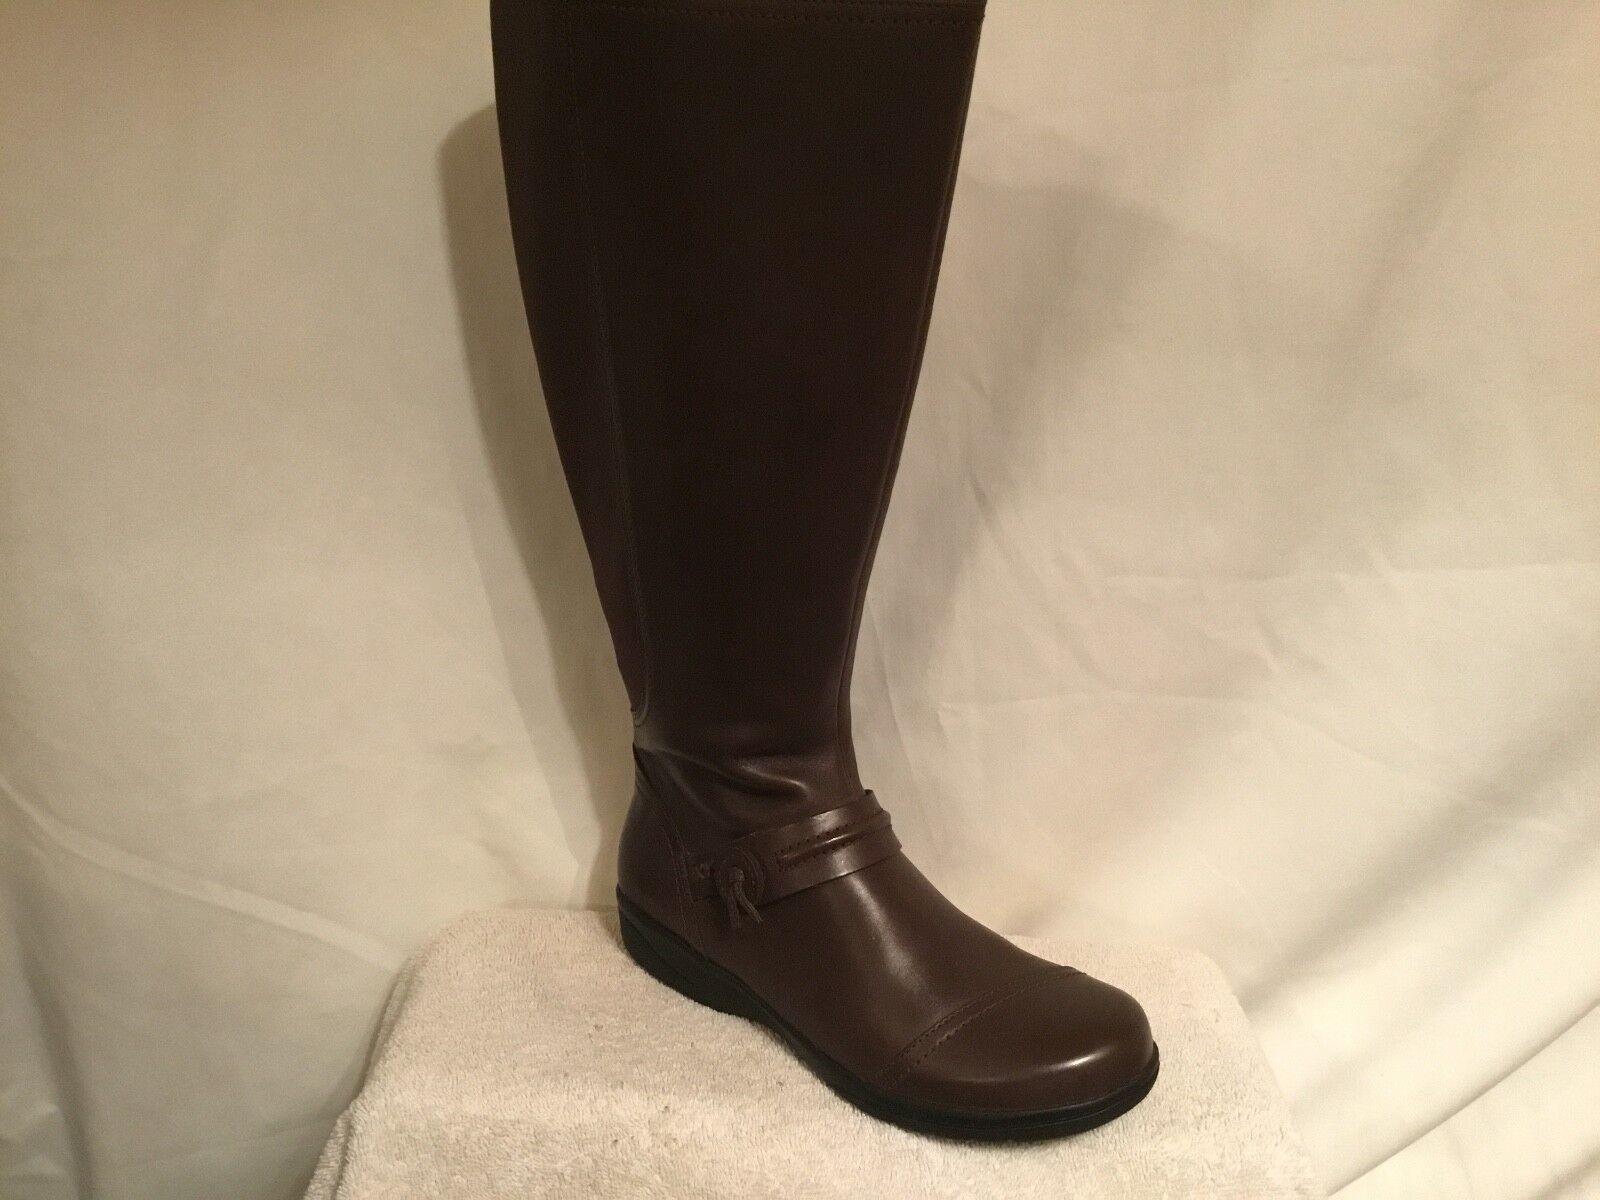 Clarks Leder Wide Calf Tall Shaft Stiefel - Cheyn Whisk Braun 11 med